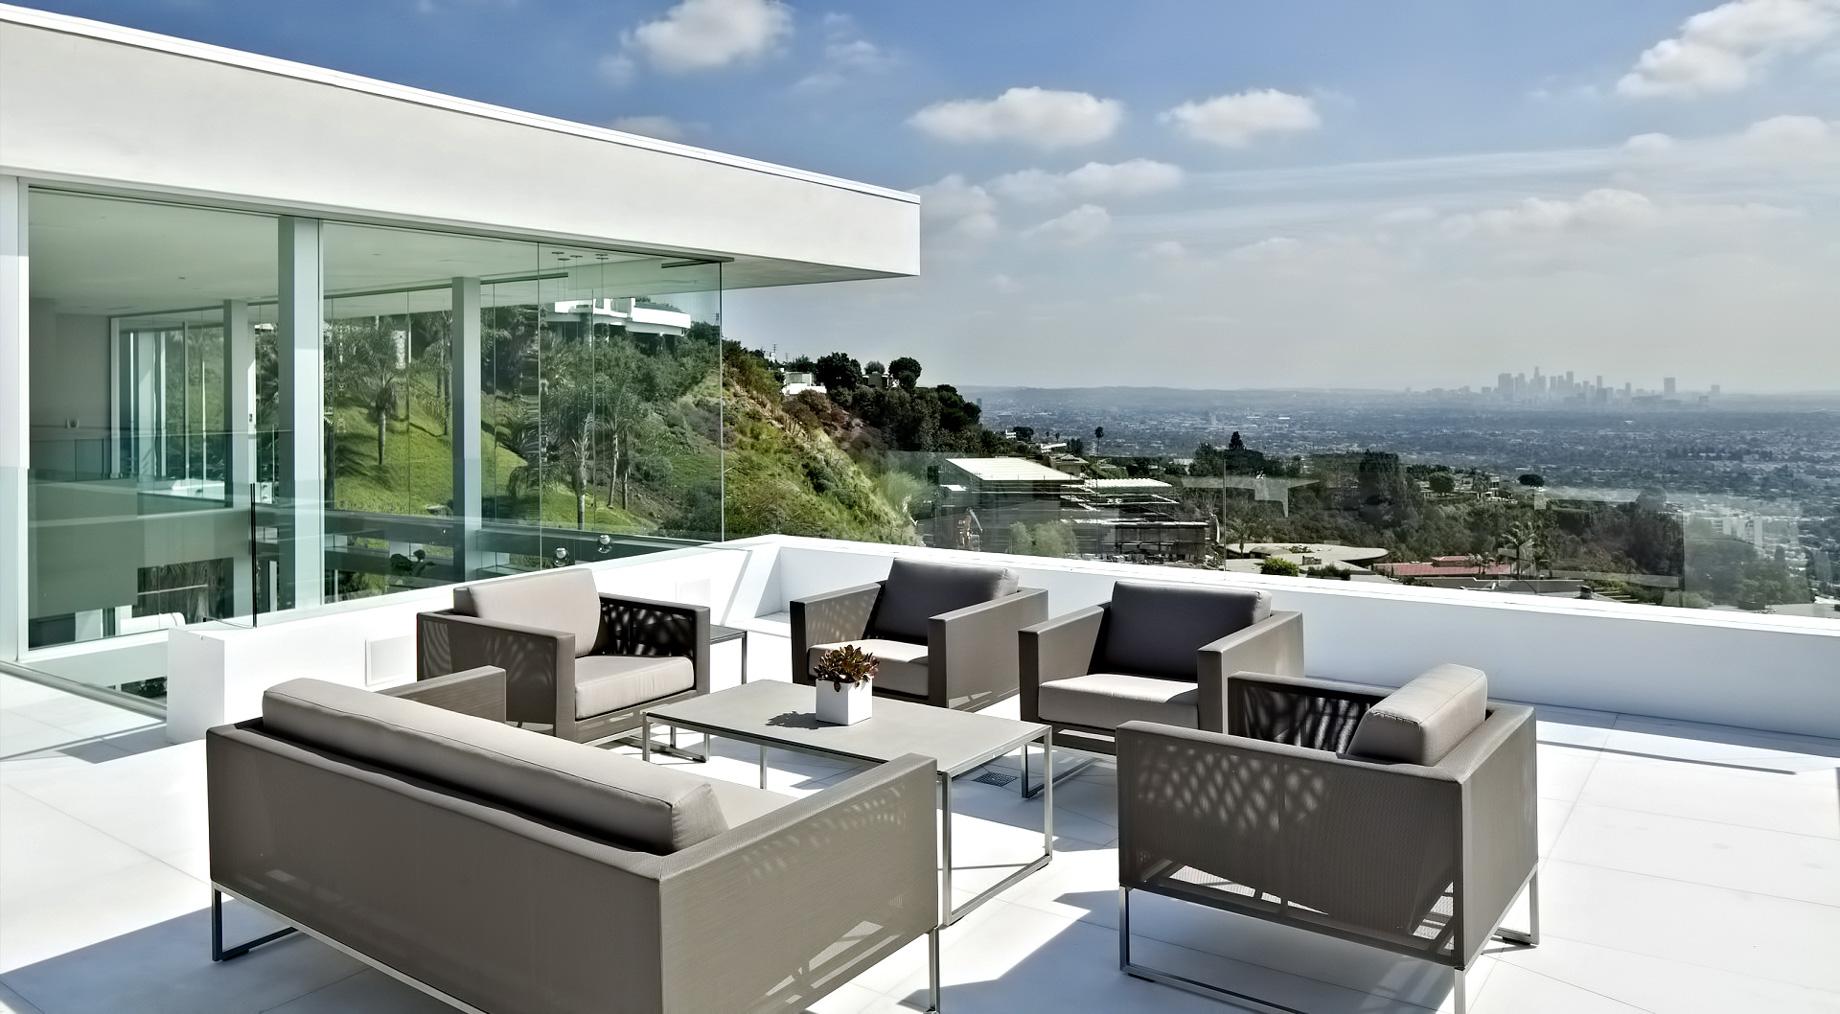 Front Row Modern - 9150 Oriole Way, Los Angeles, CA, USA